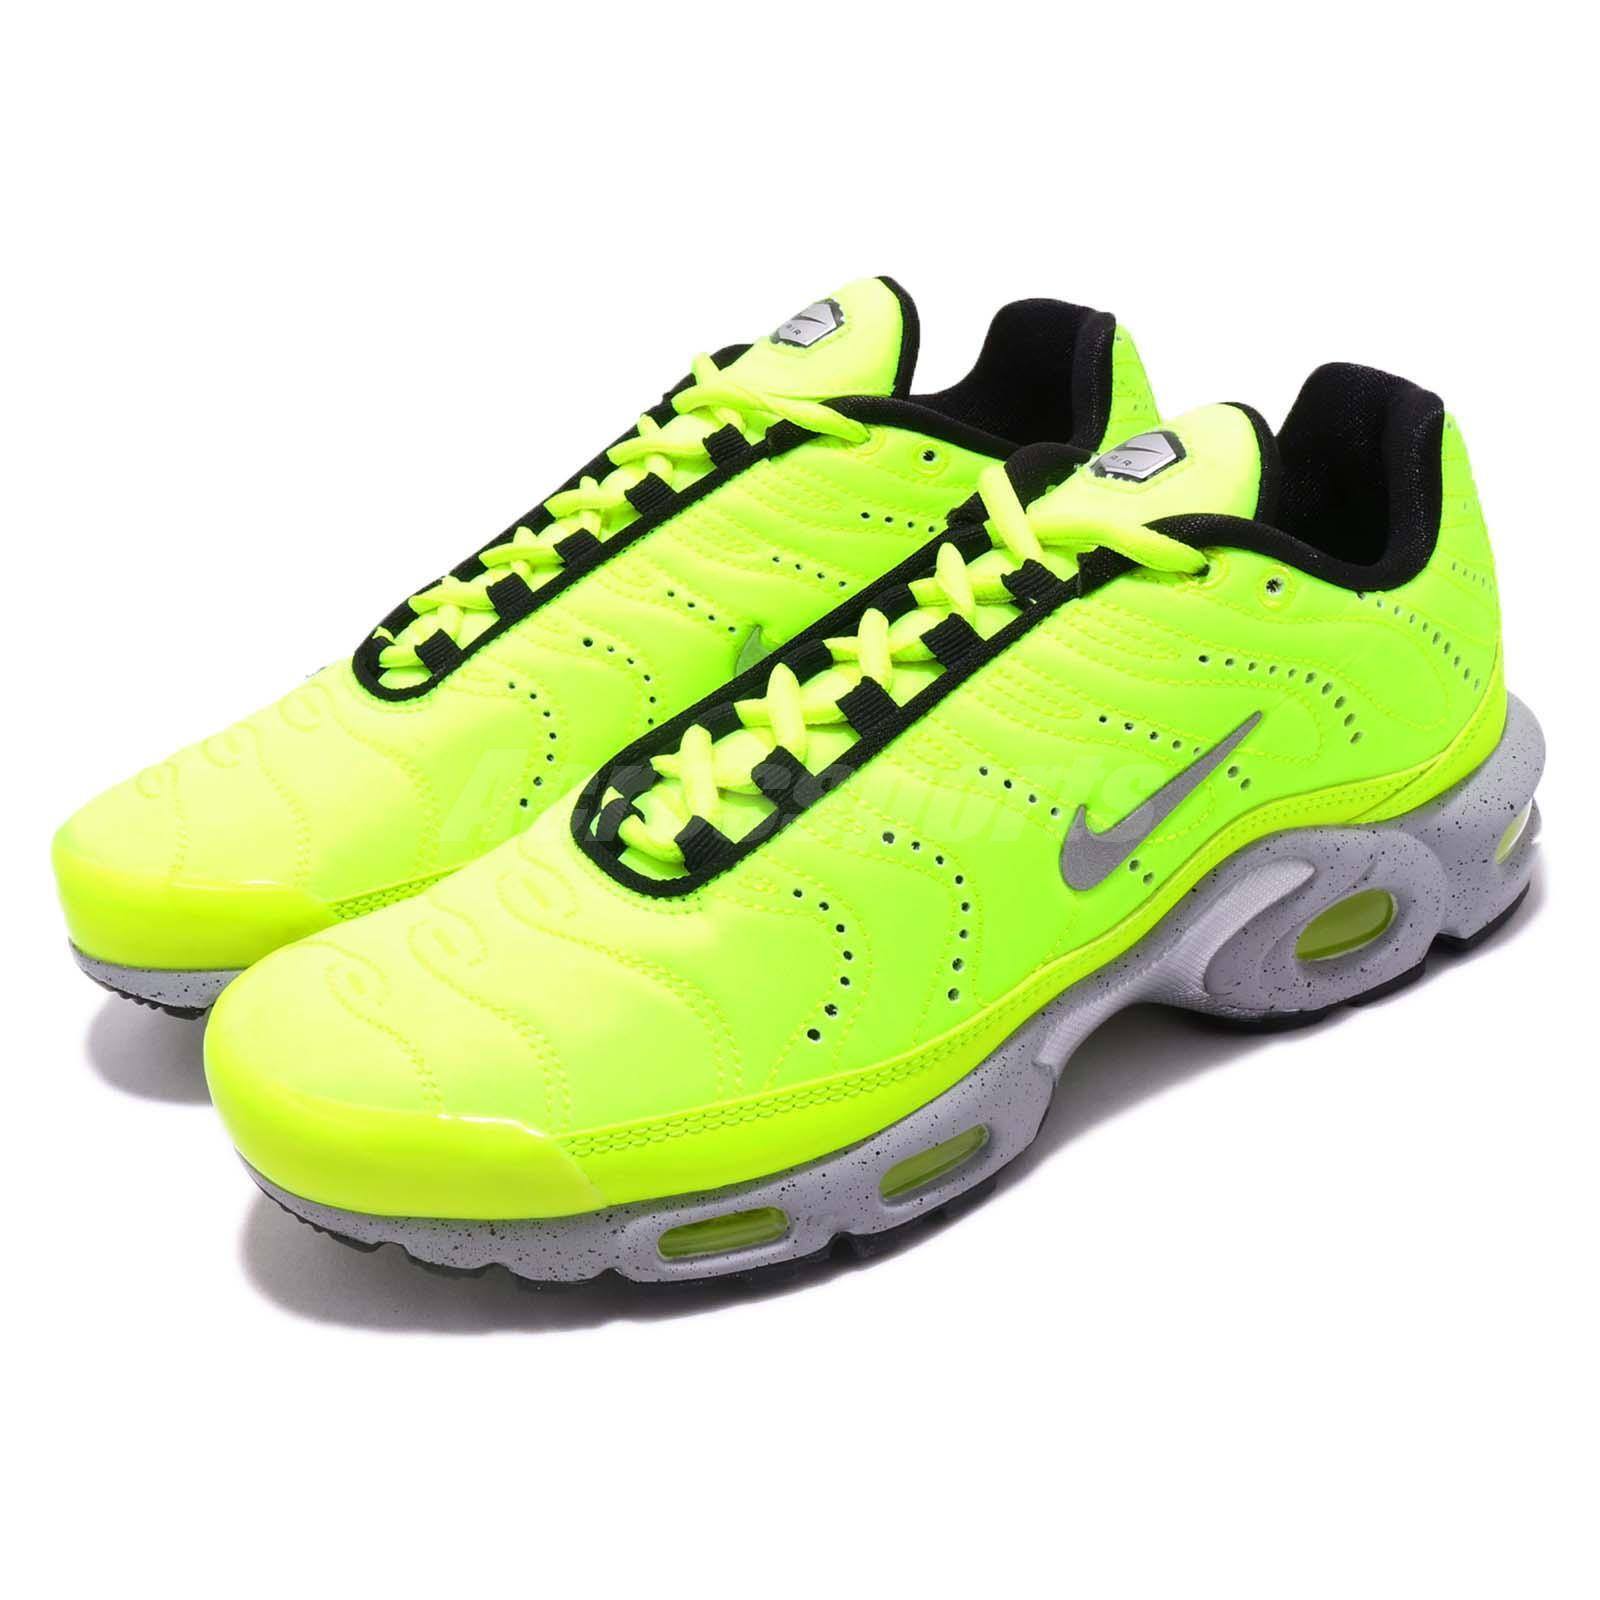 Nike Air Max Plus Classic PRM / NS Retro Classic Plus Men Running Chaussures Baskets Pick 1 12d277